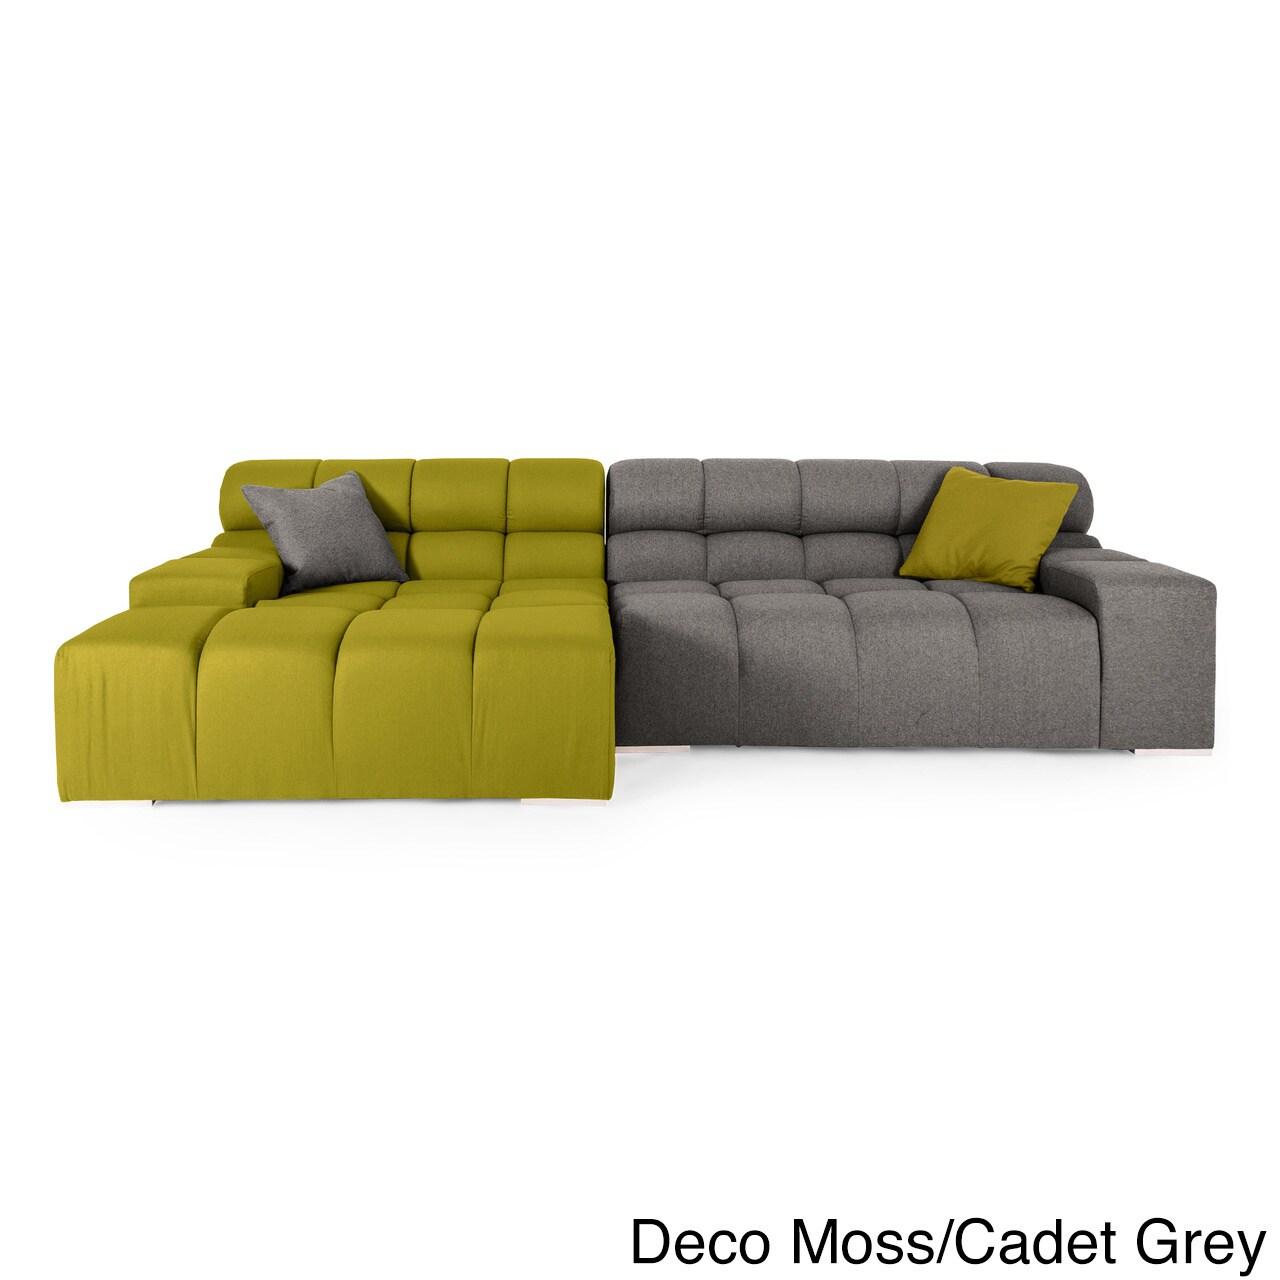 Karl Cubix Modern Modular Premium Cashmere Left Sofa Sectional Free Shipping Today 12776877